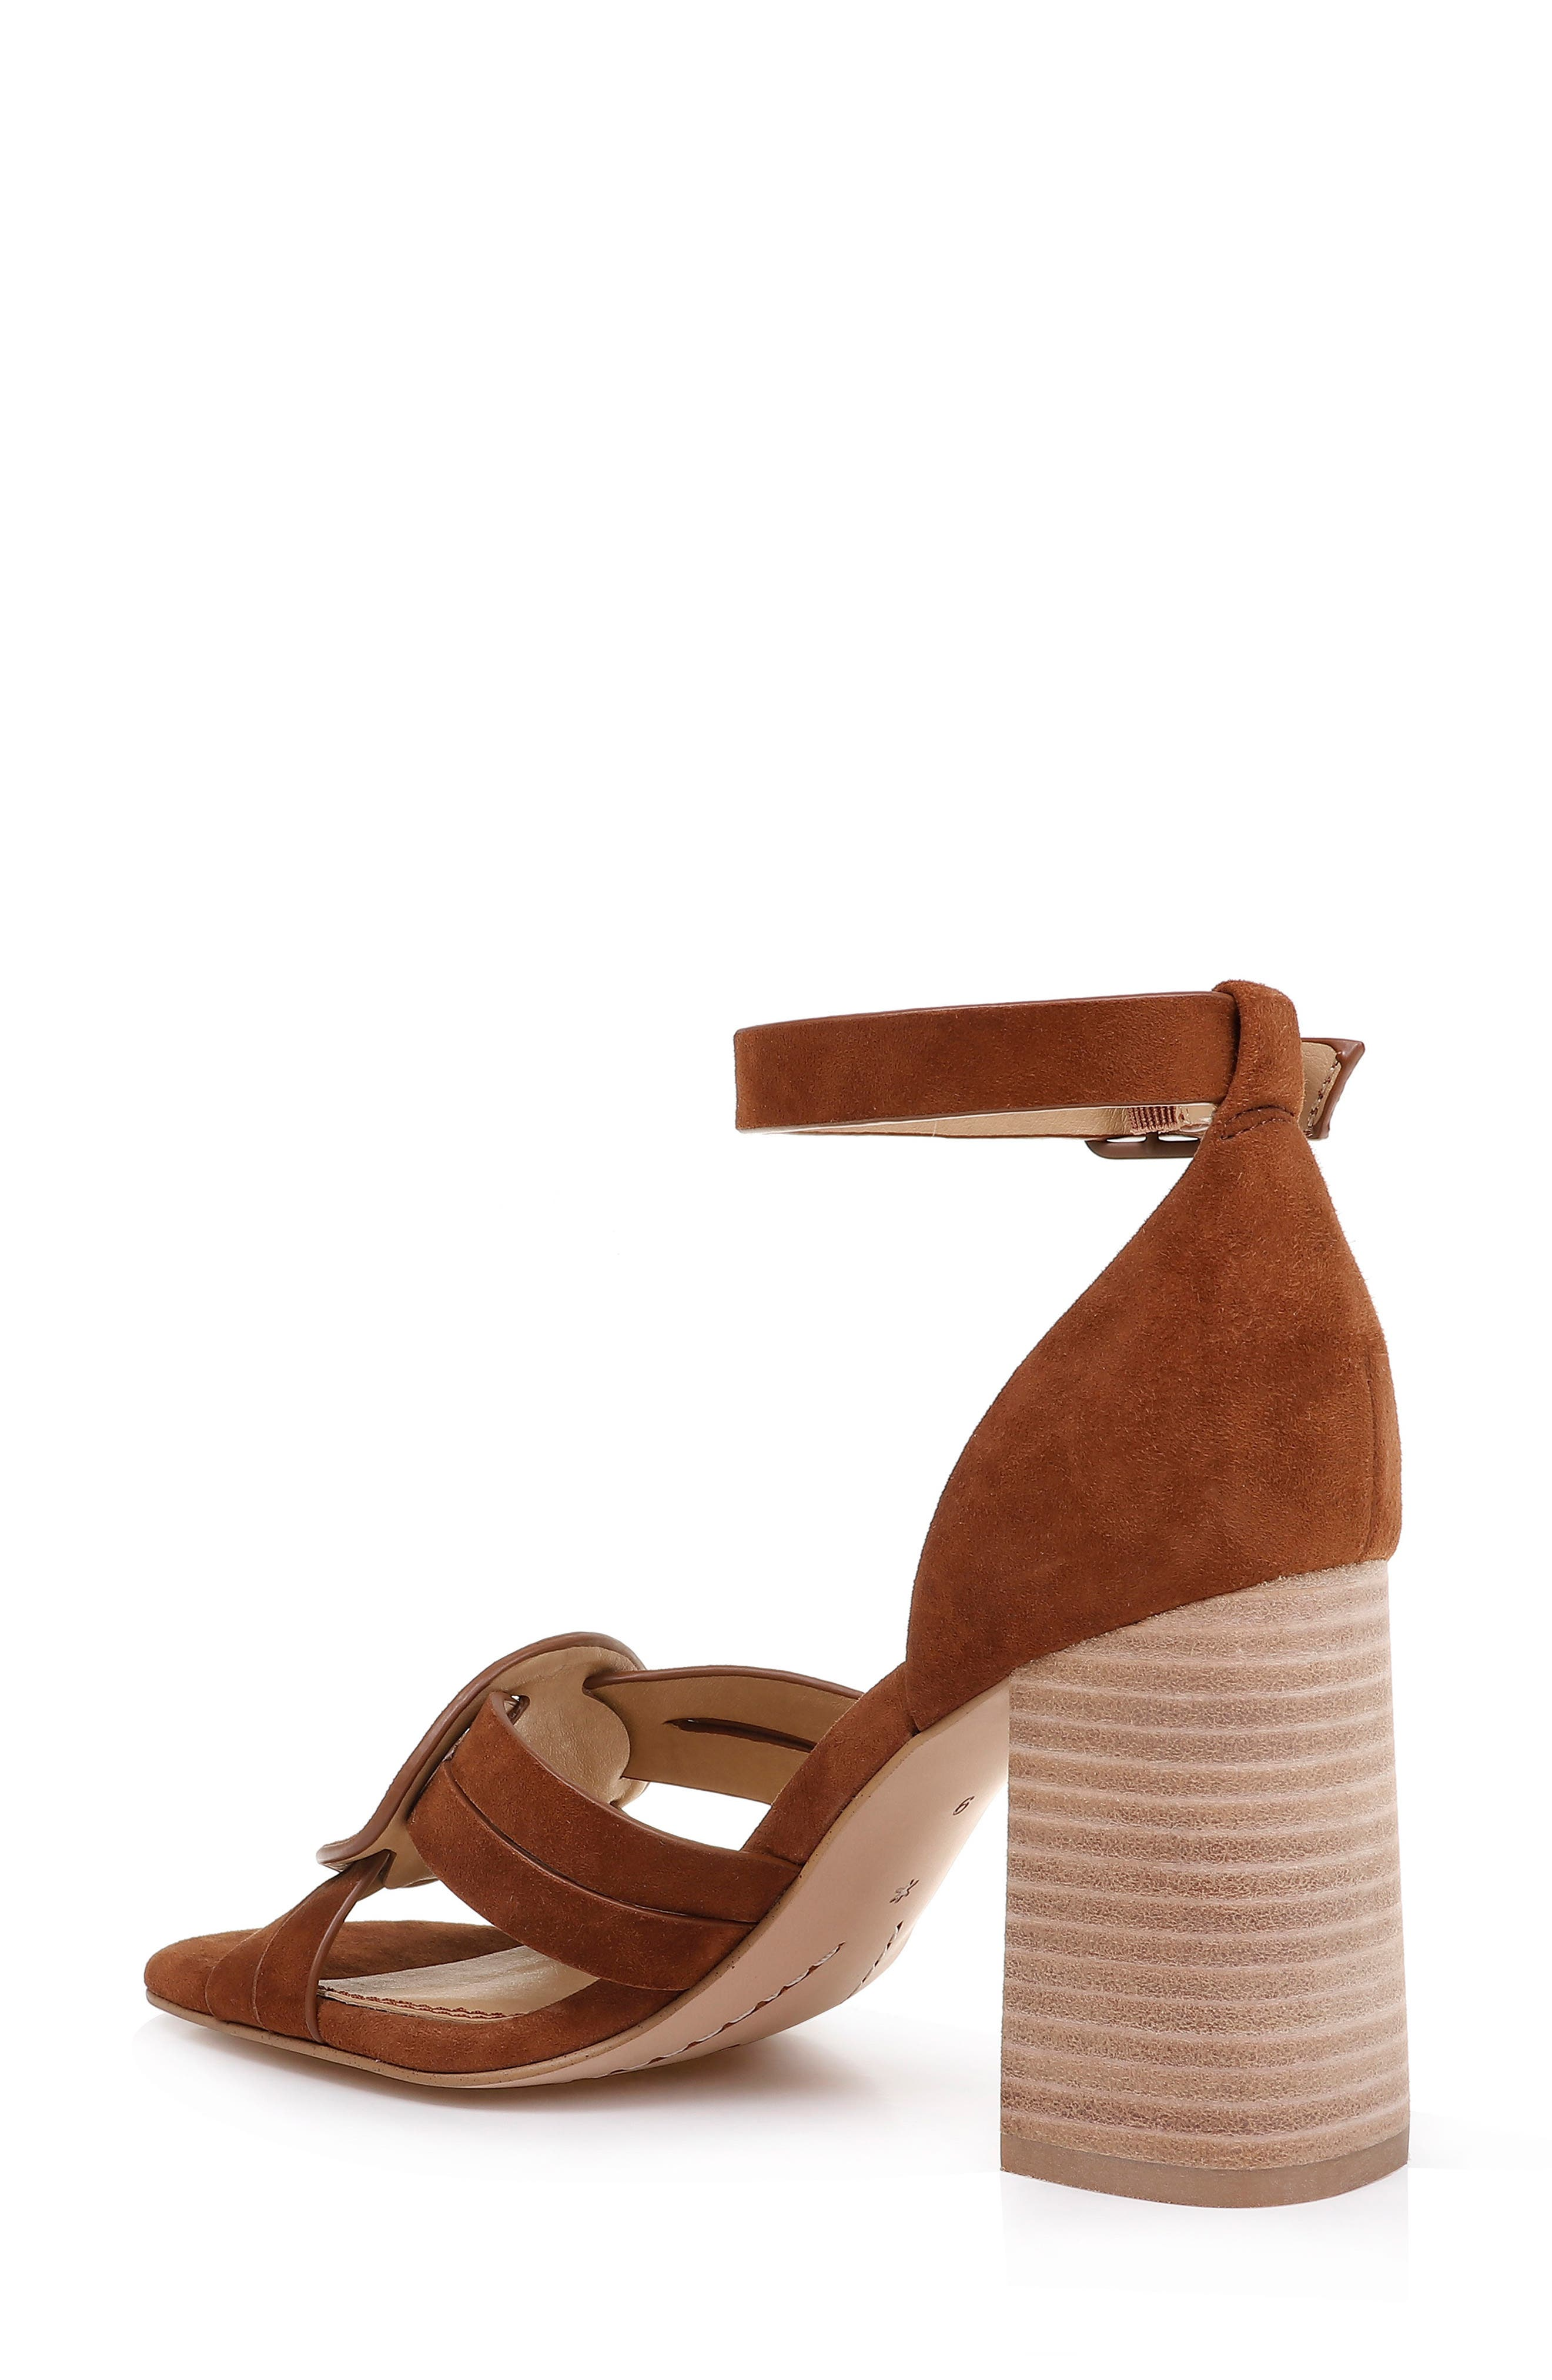 SPLENDID, Tallie Ankle Strap Sandal, Alternate thumbnail 2, color, CHESTNUT SUEDE